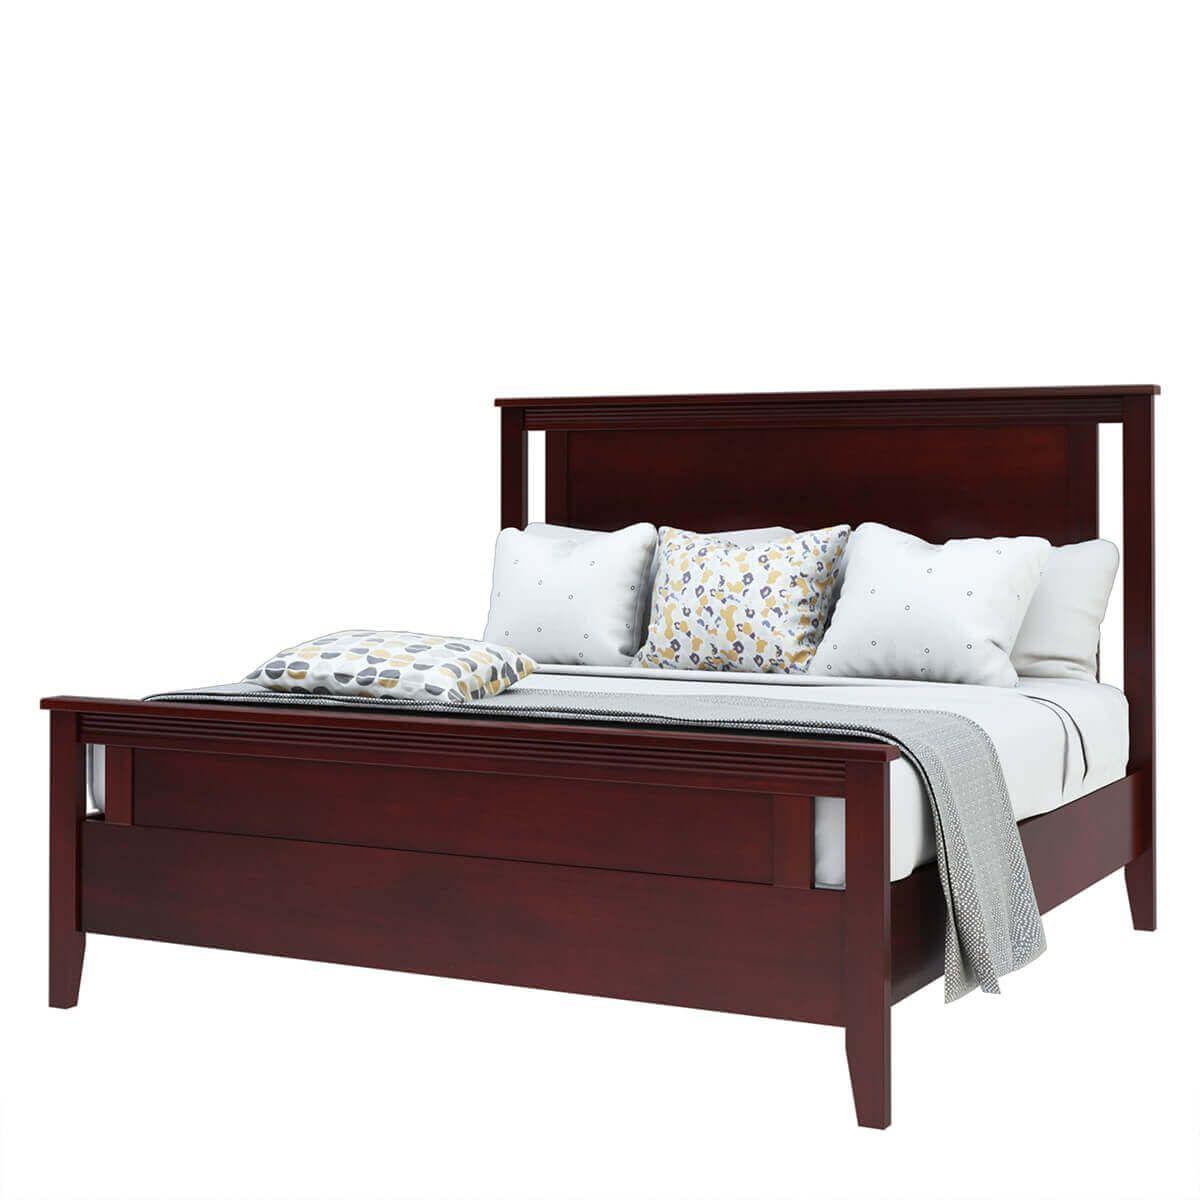 Amenia Solid Mahogany Wood 6 Piece Bedroom Set In 2020 Bedroom Set Wood Bedroom Sets Contemporary Style Furniture